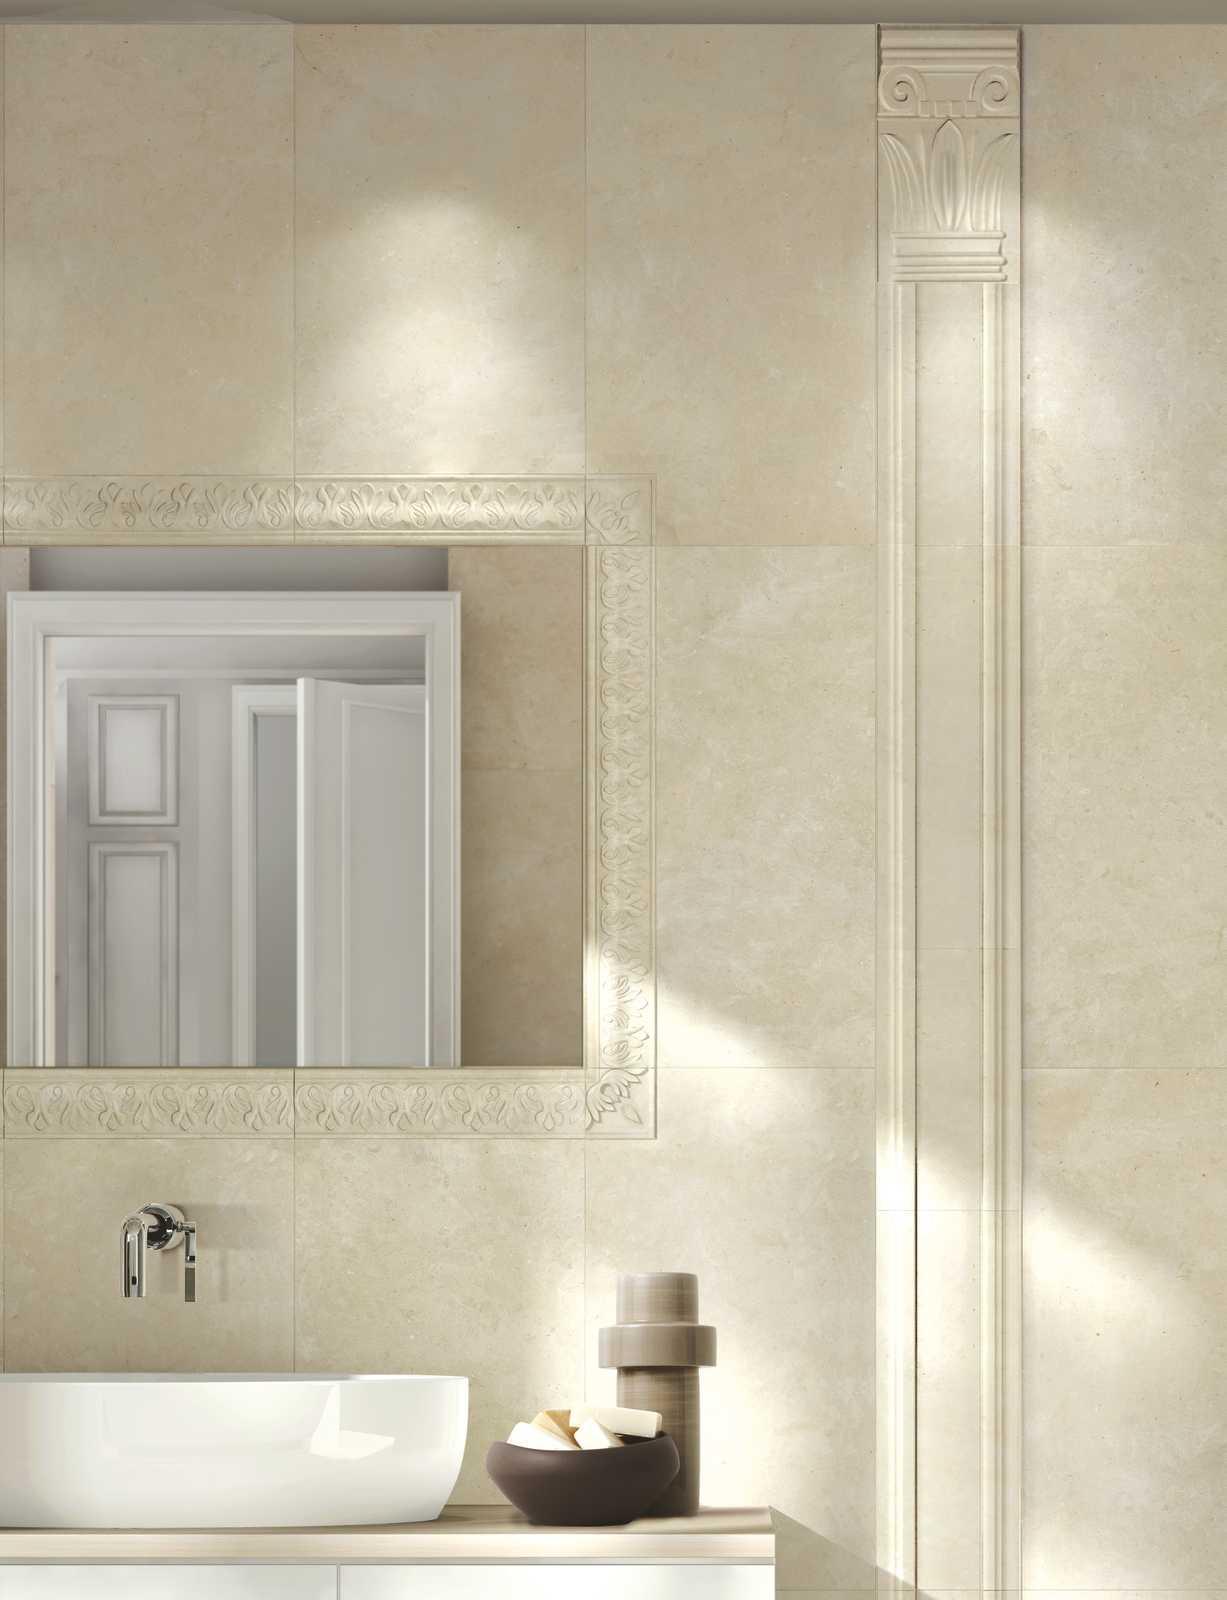 Pietra di noto porcelain stoneware flooring marazzi pietra di noto ceramic tiles marazzi4231 dailygadgetfo Choice Image